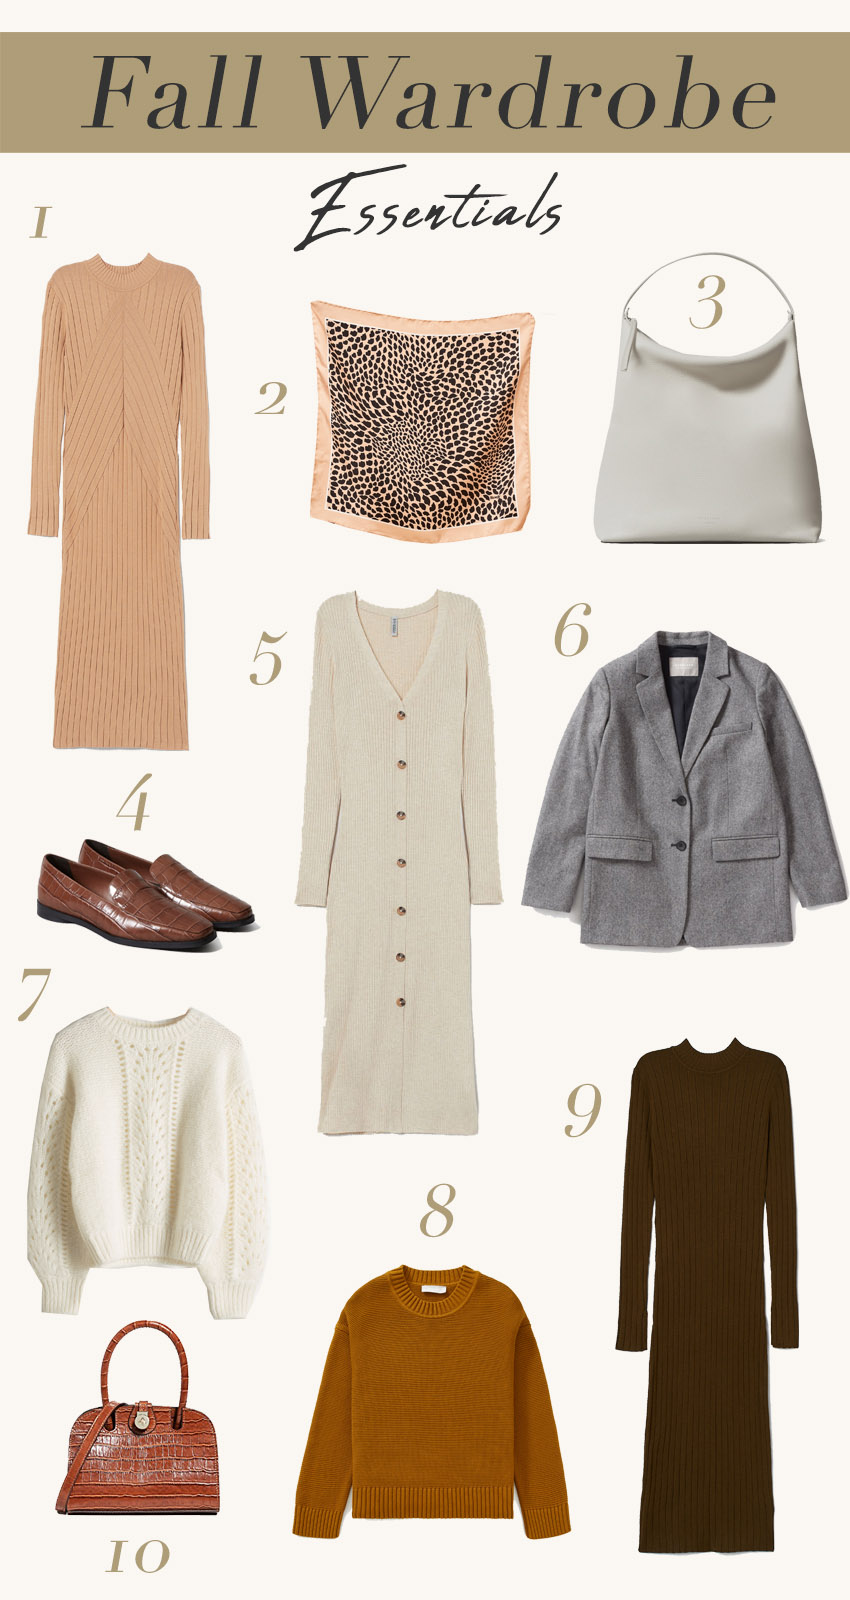 Fall Wardrobe Essentials for the minimalist